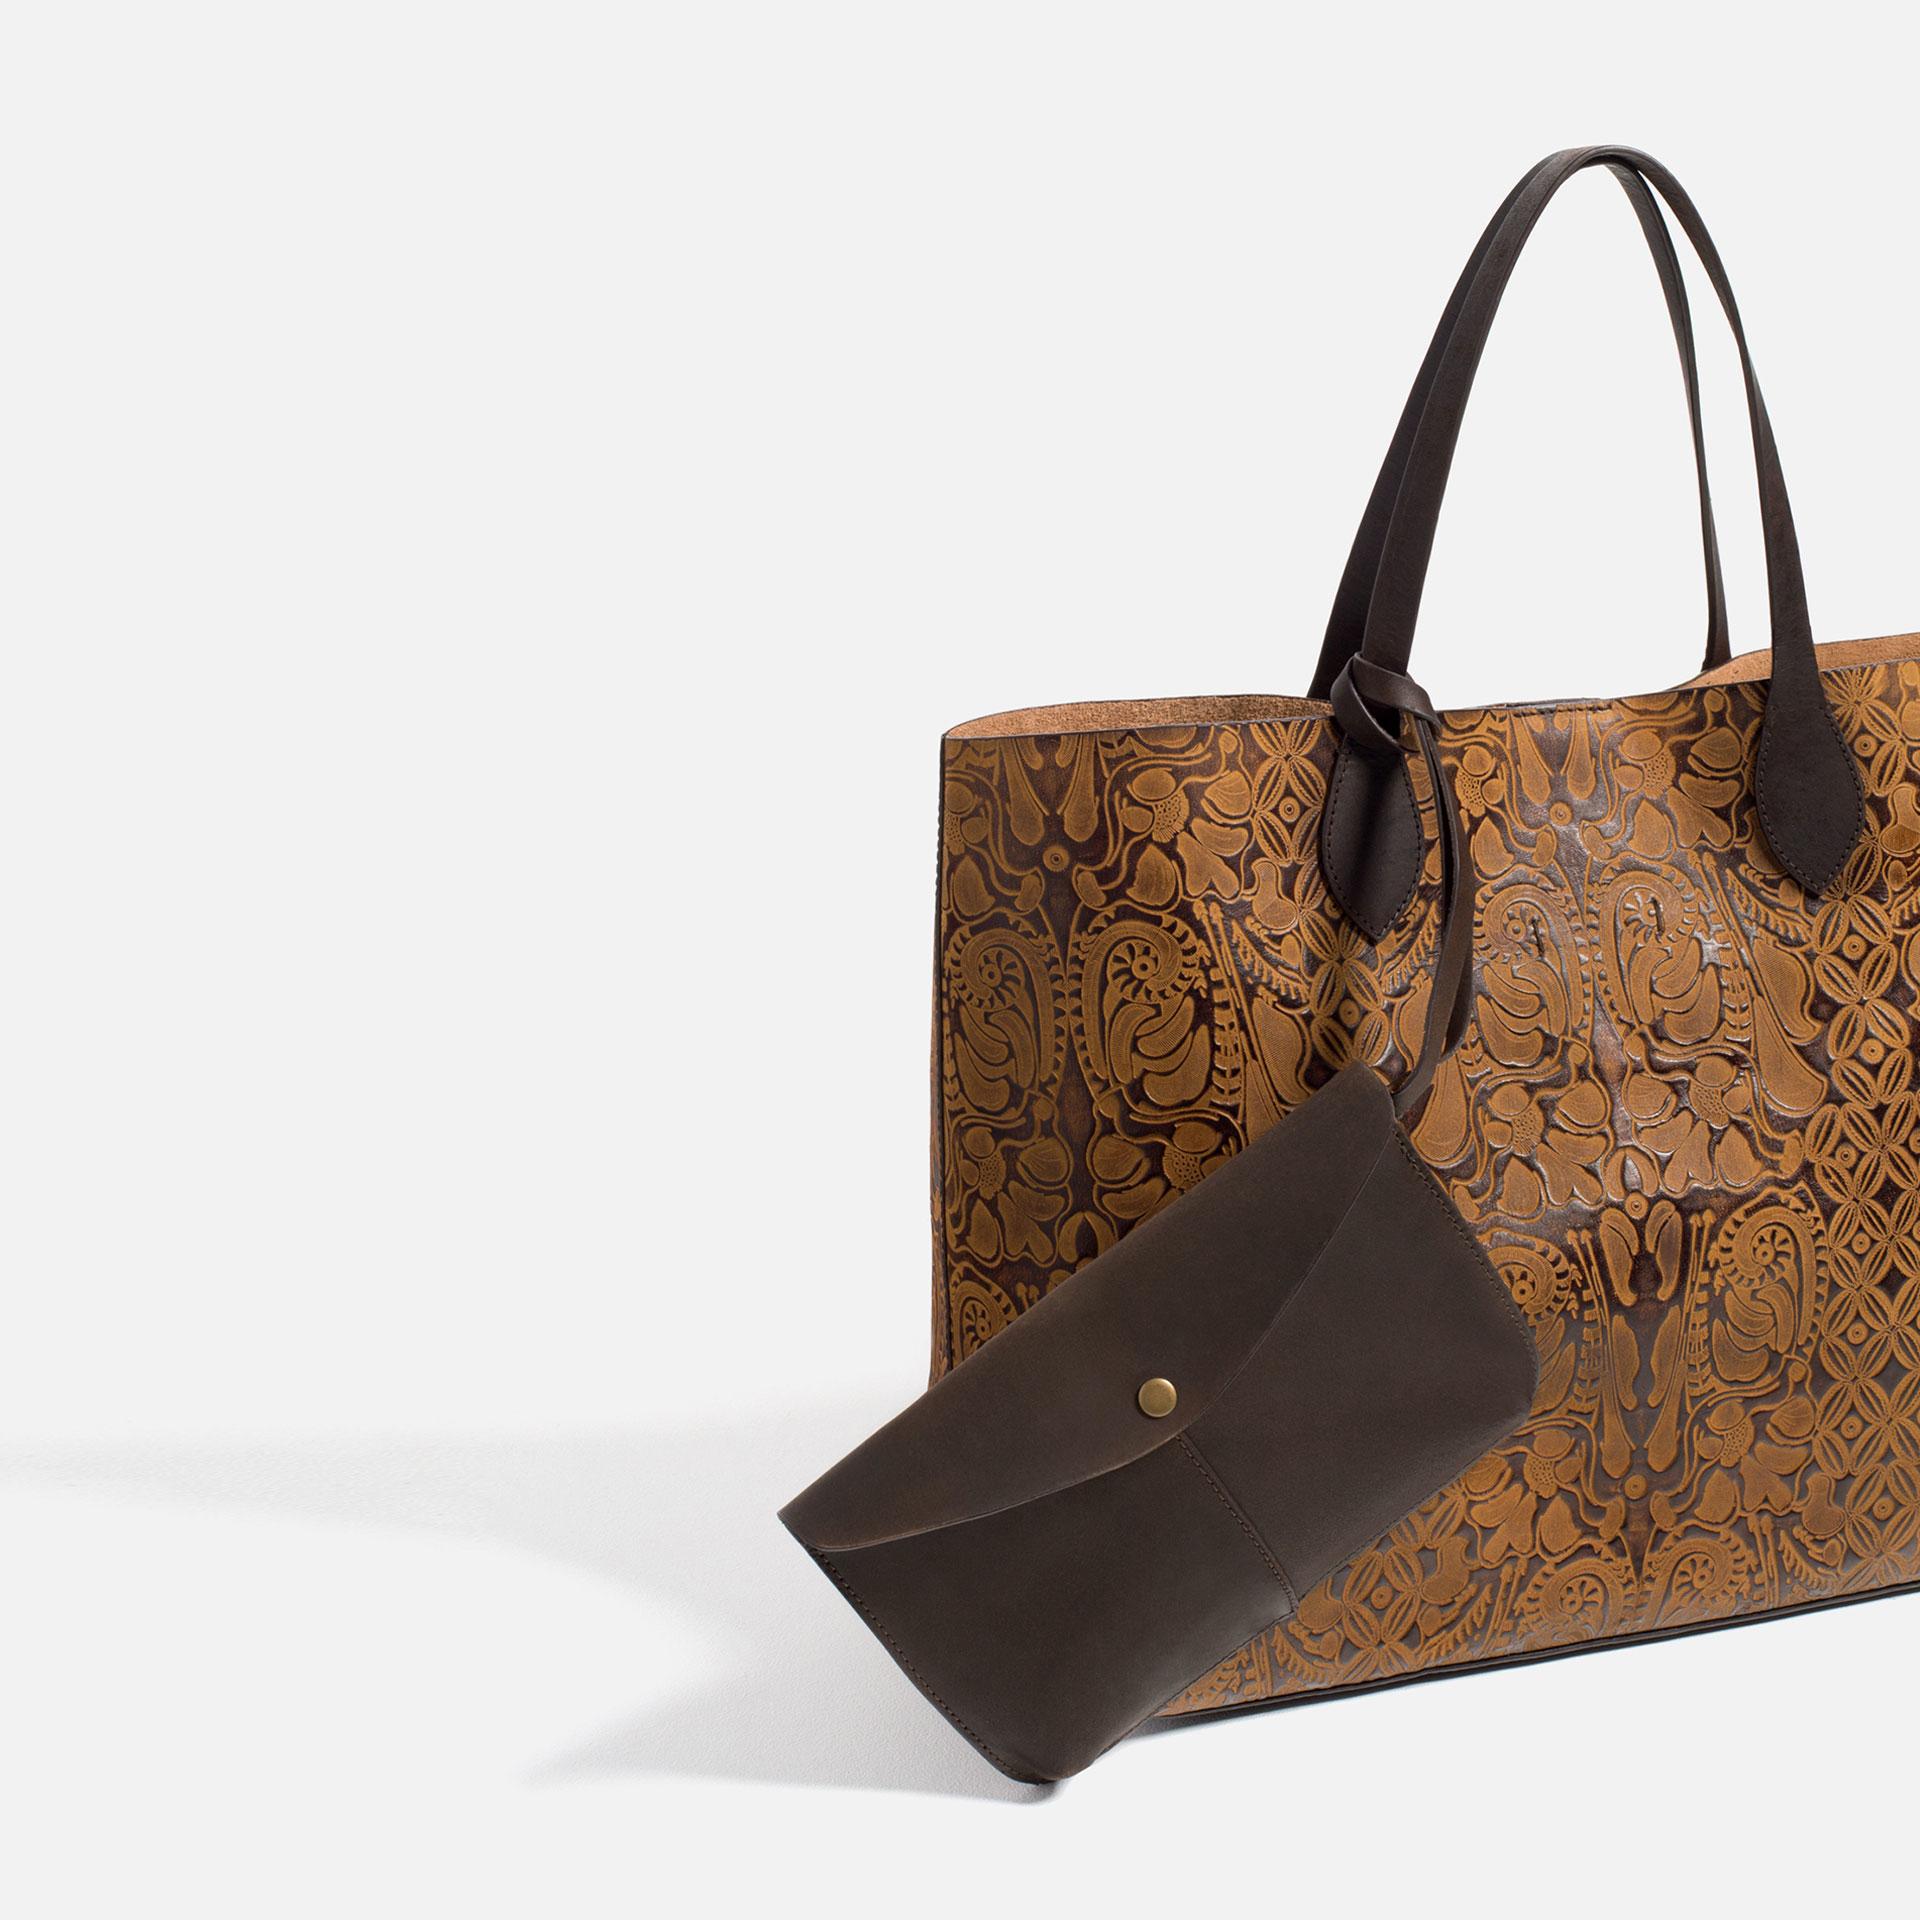 Zara Embossed Leather Tote In Brown Lyst